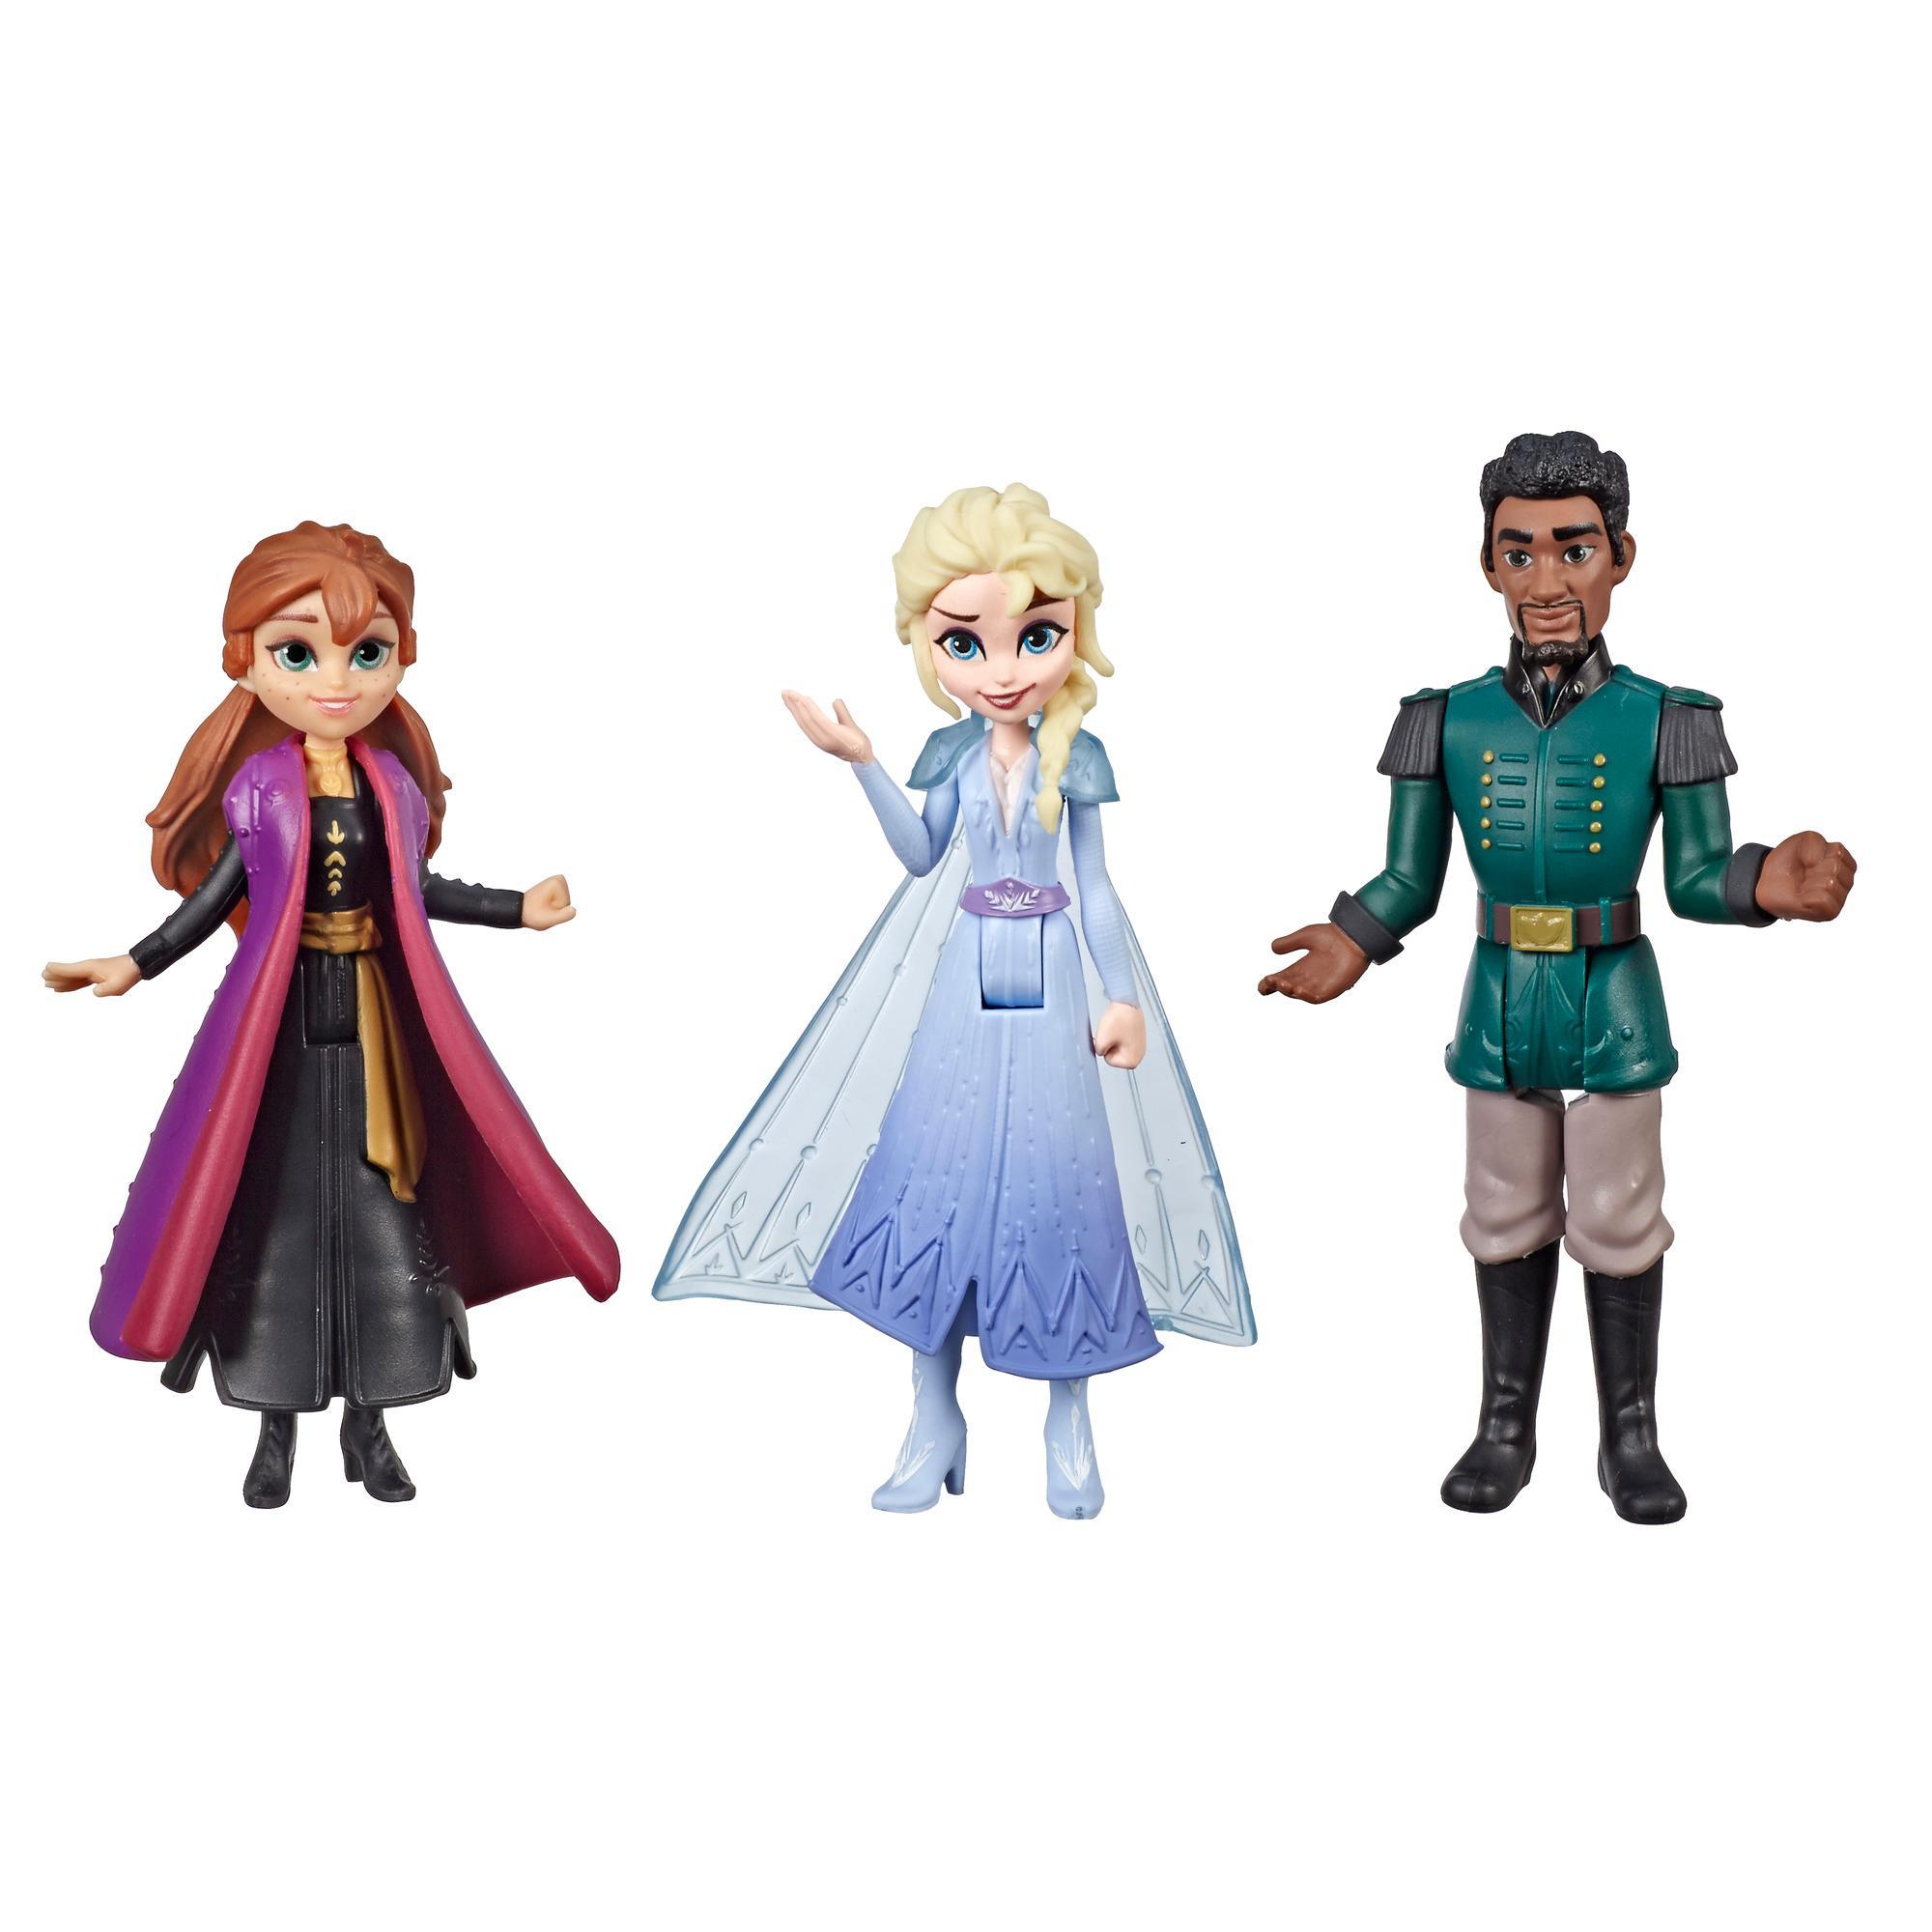 Disney Frozen Anna, Elsa, and Mattias Small Dolls 3-Pack Inspired by the Disney Frozen 2 Movie